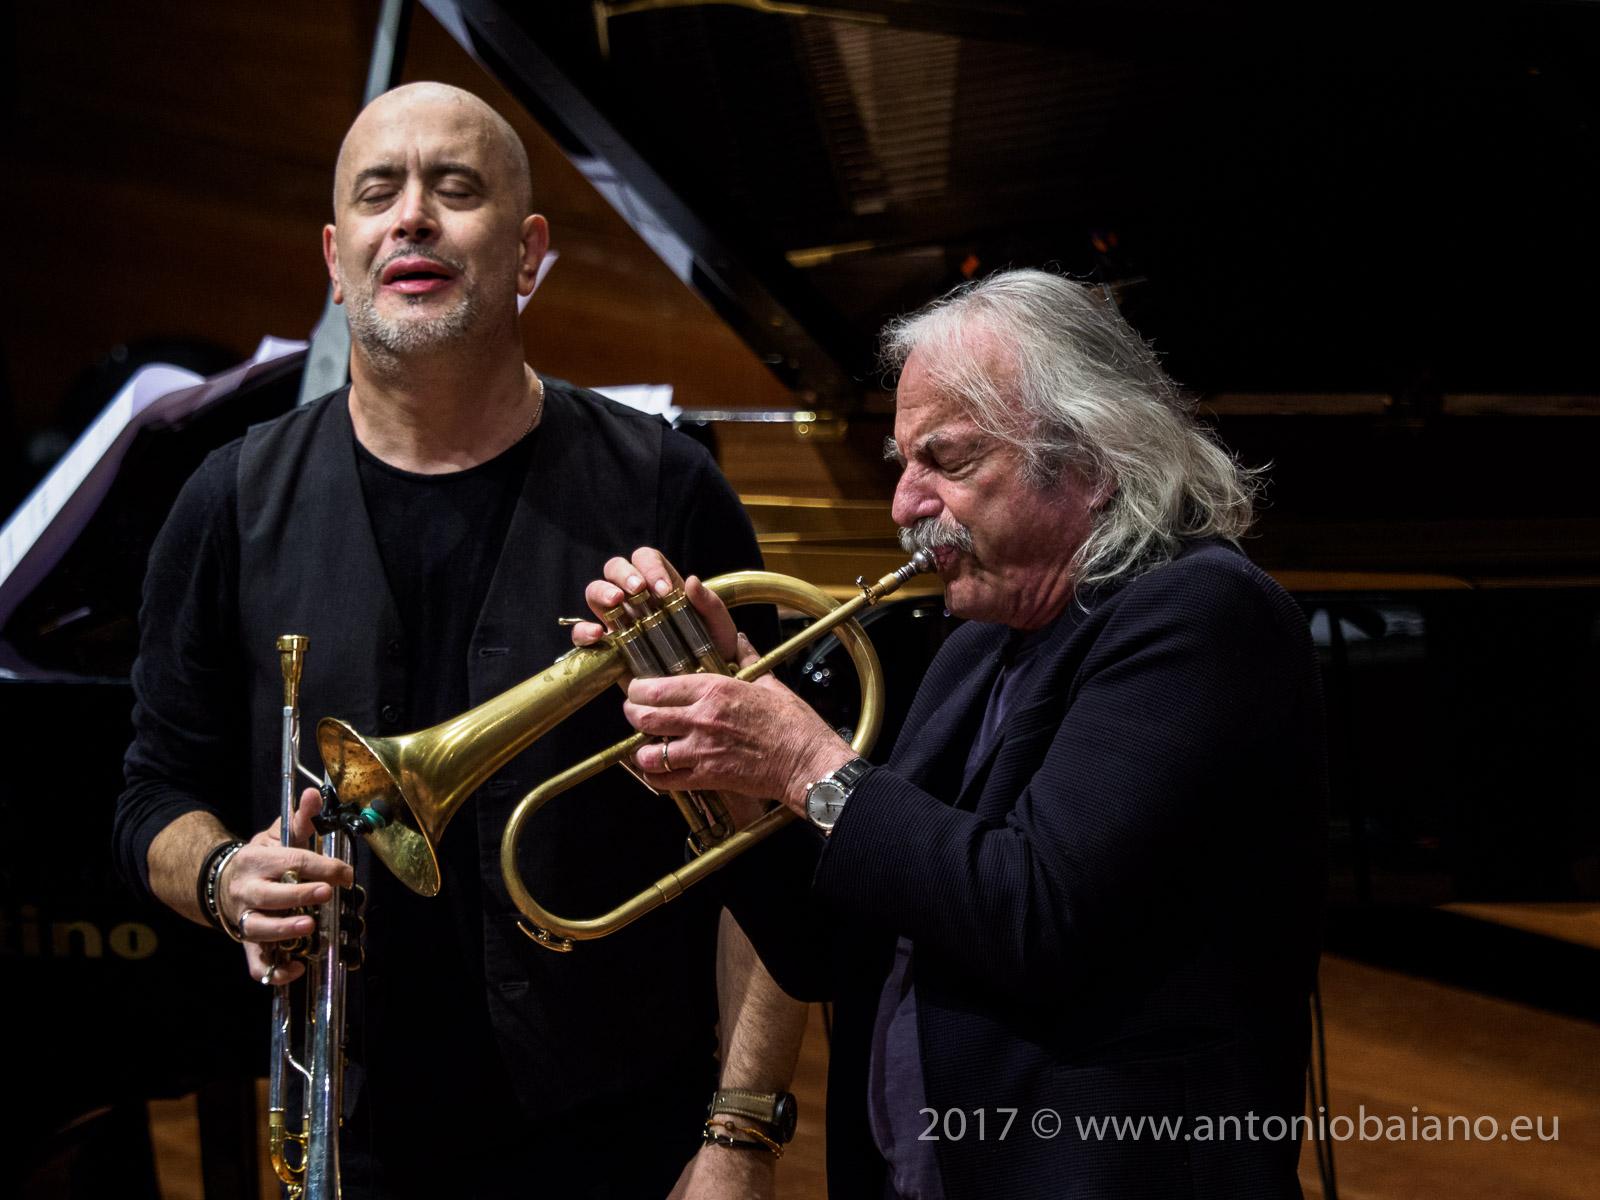 Flavio Boltro and Enrico Rava - Dizzy Gillespie Centenary - Moncalieri Jazz Festival